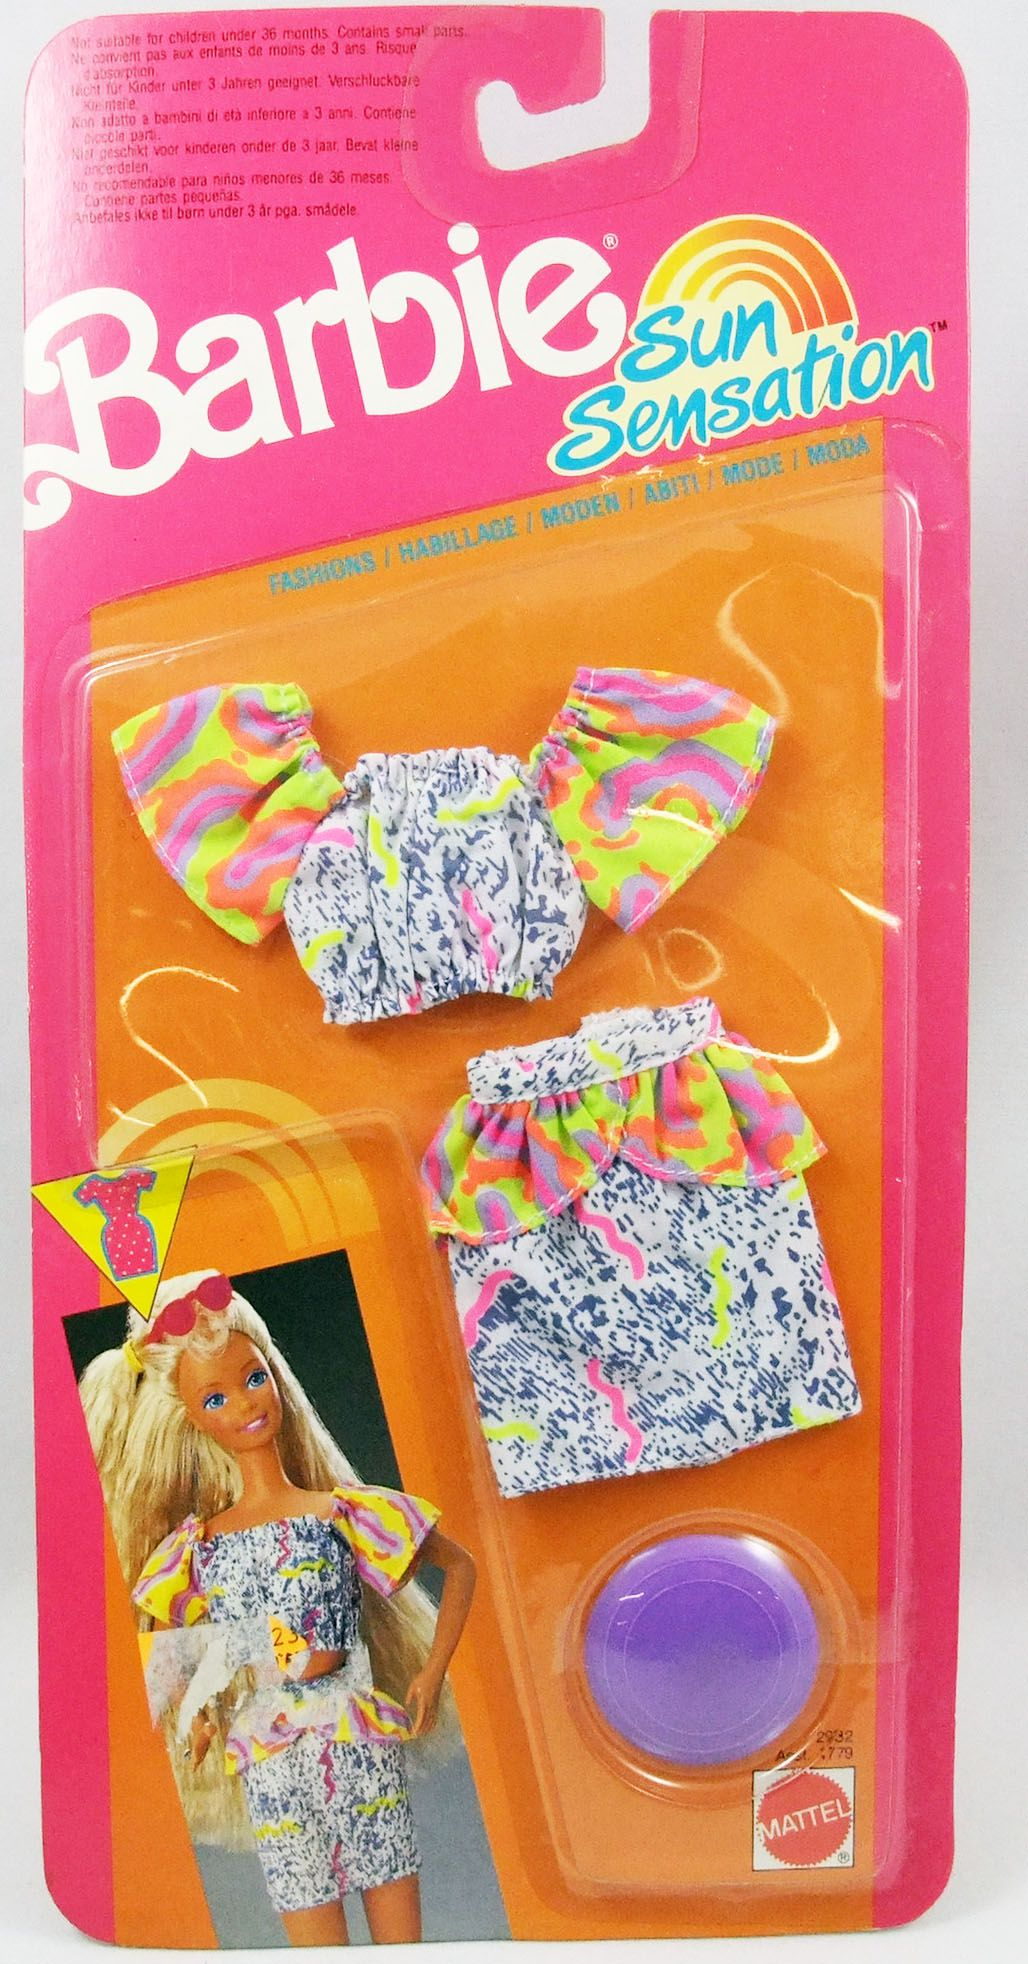 Barbie - Sun Sensation Fashions - Mattel 1991 (ref.2932)